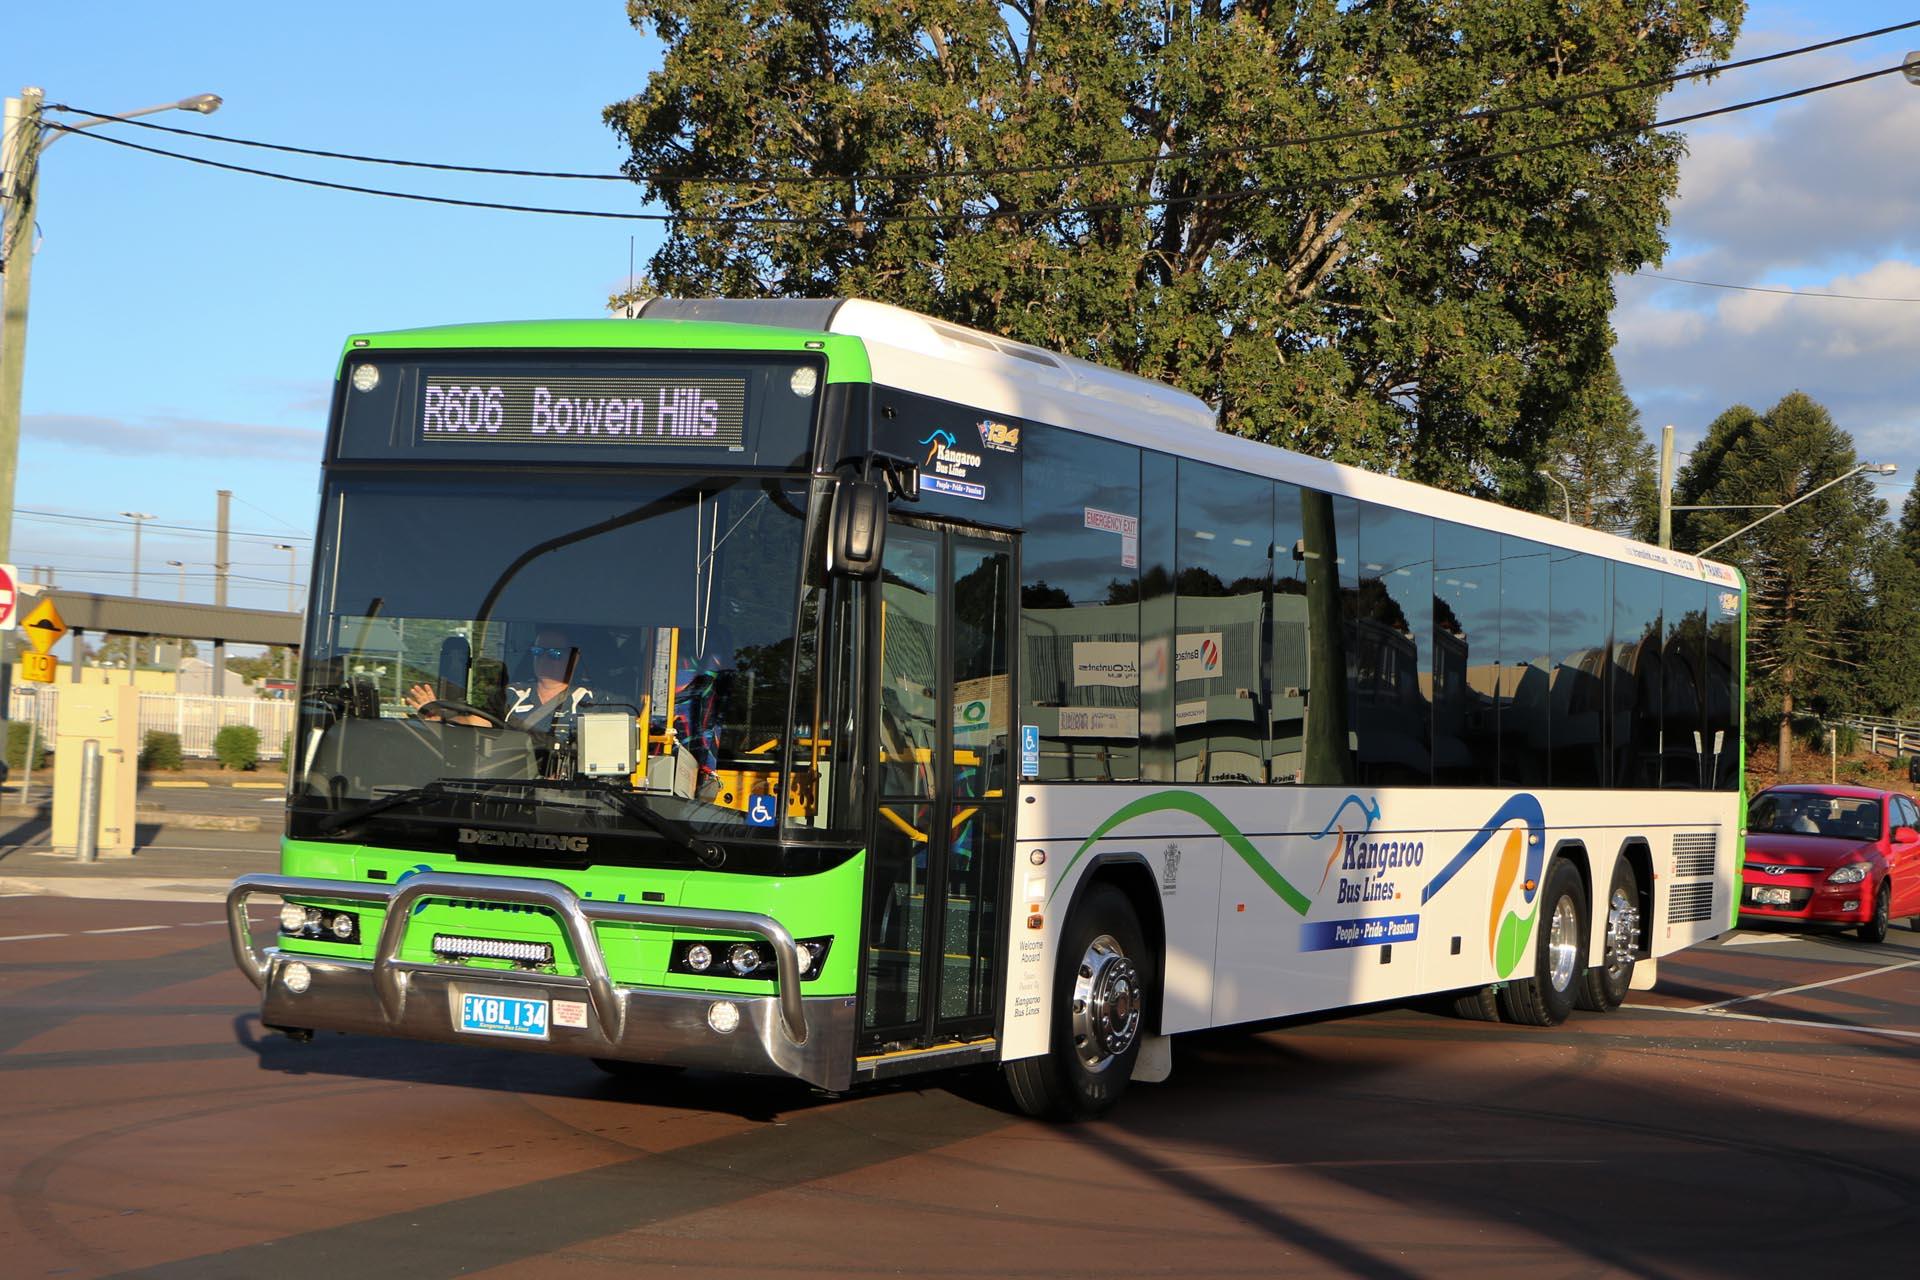 Public Transport Kangaroo Bus Lines